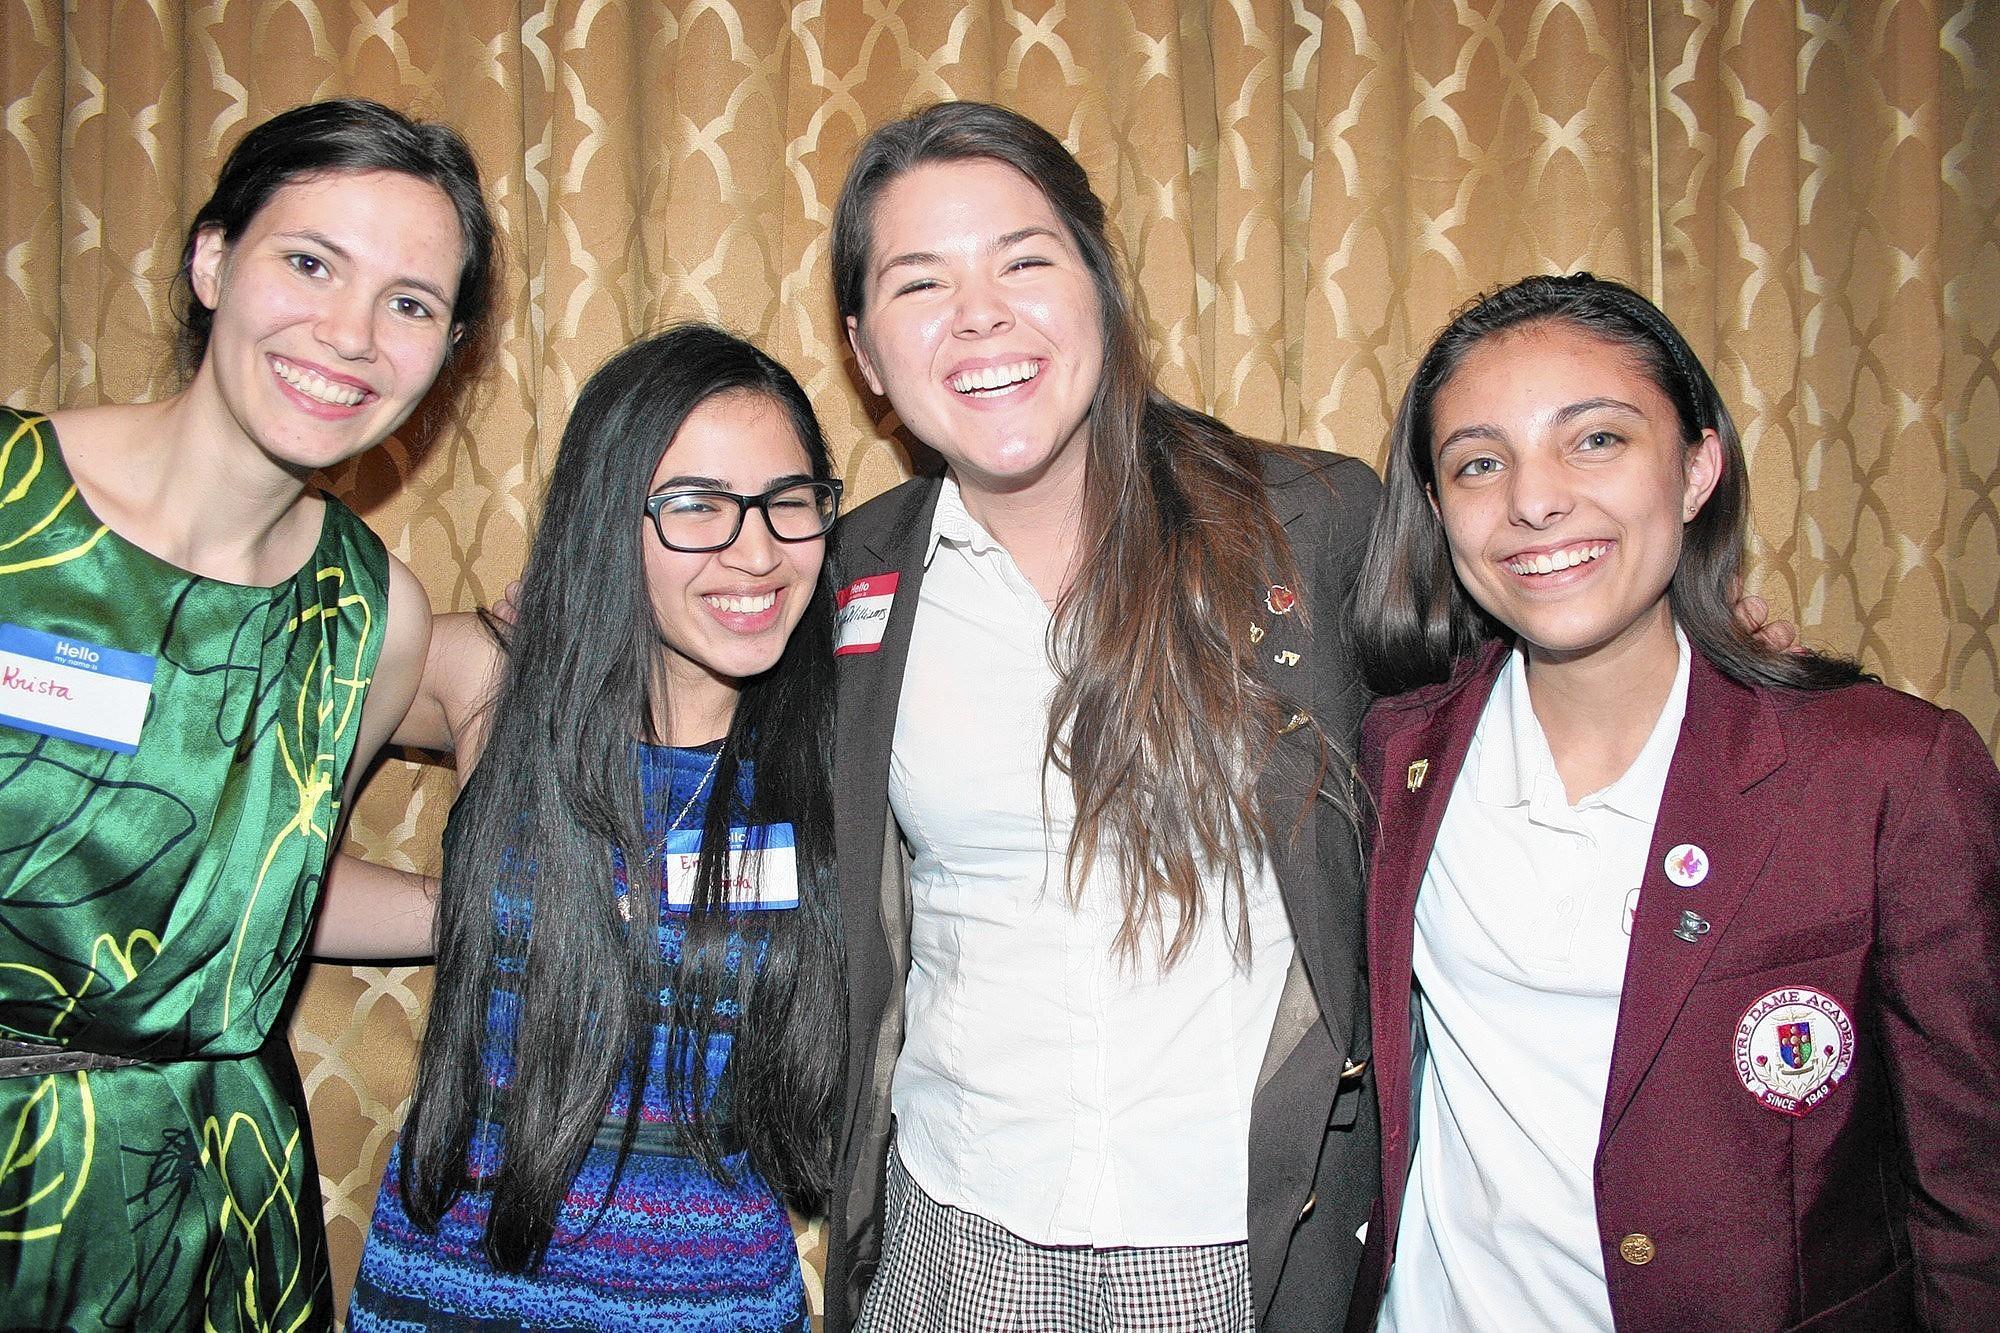 Cabrini Literary Guild writing awardees, from left: Krista Gelev, Emily Garcia, Sonya Williams and Katherine Irajpanah.